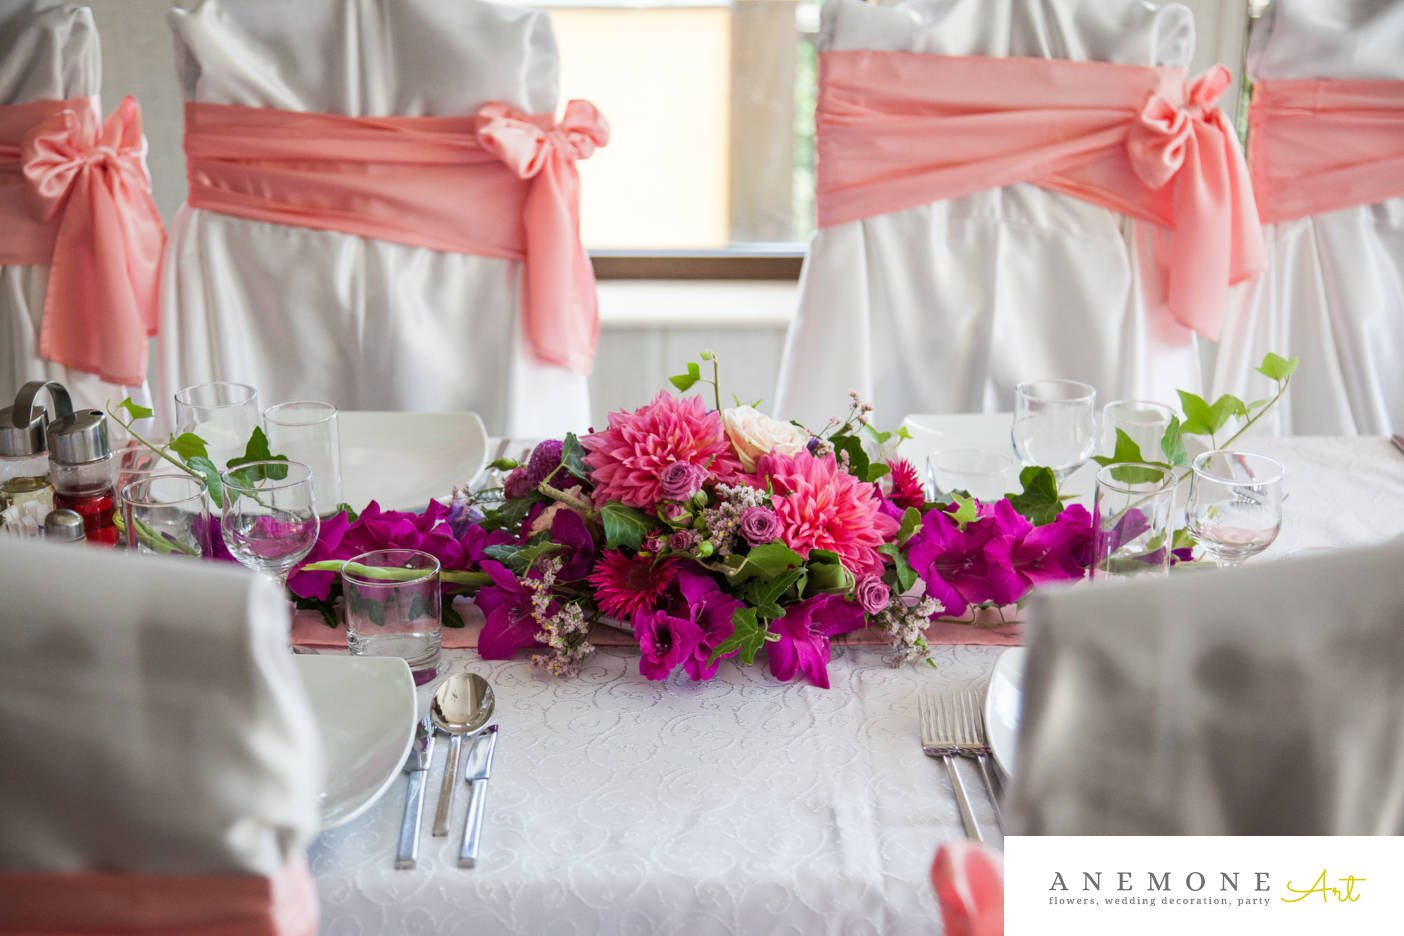 Poza, foto cu Flori de nunta decor masa, hotel central in Arad, Timisoara, Oradea (wedding flowers, bouquets) nunta Arad, Timisoara, Oradea